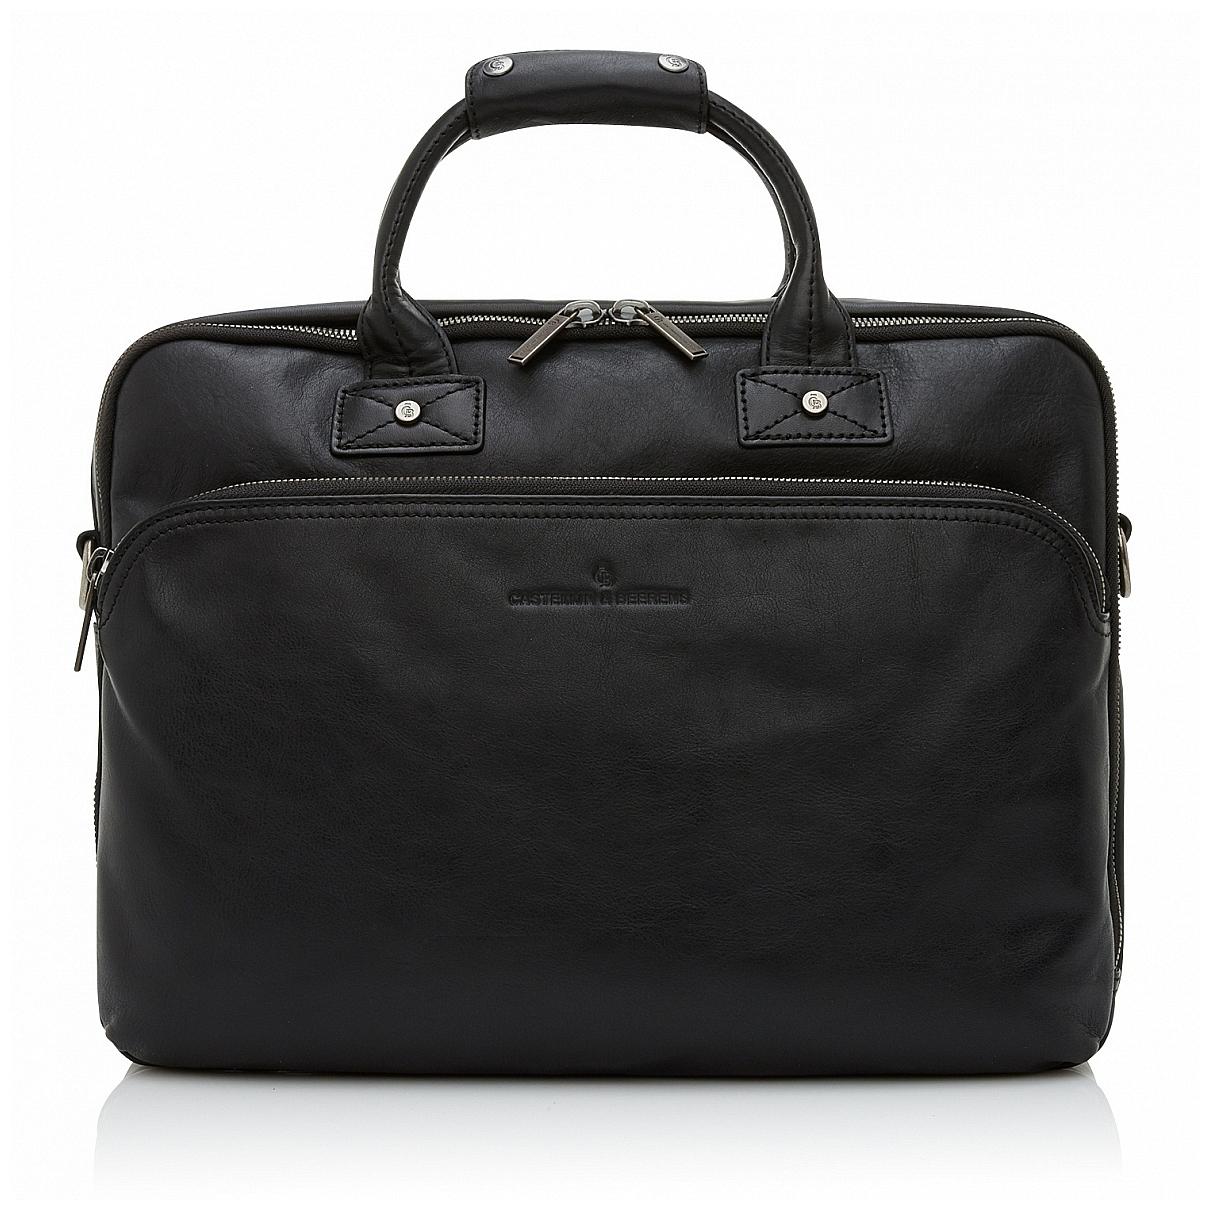 Castelijn & Beerens Kožená taška na notebook a tablet 609473 černá